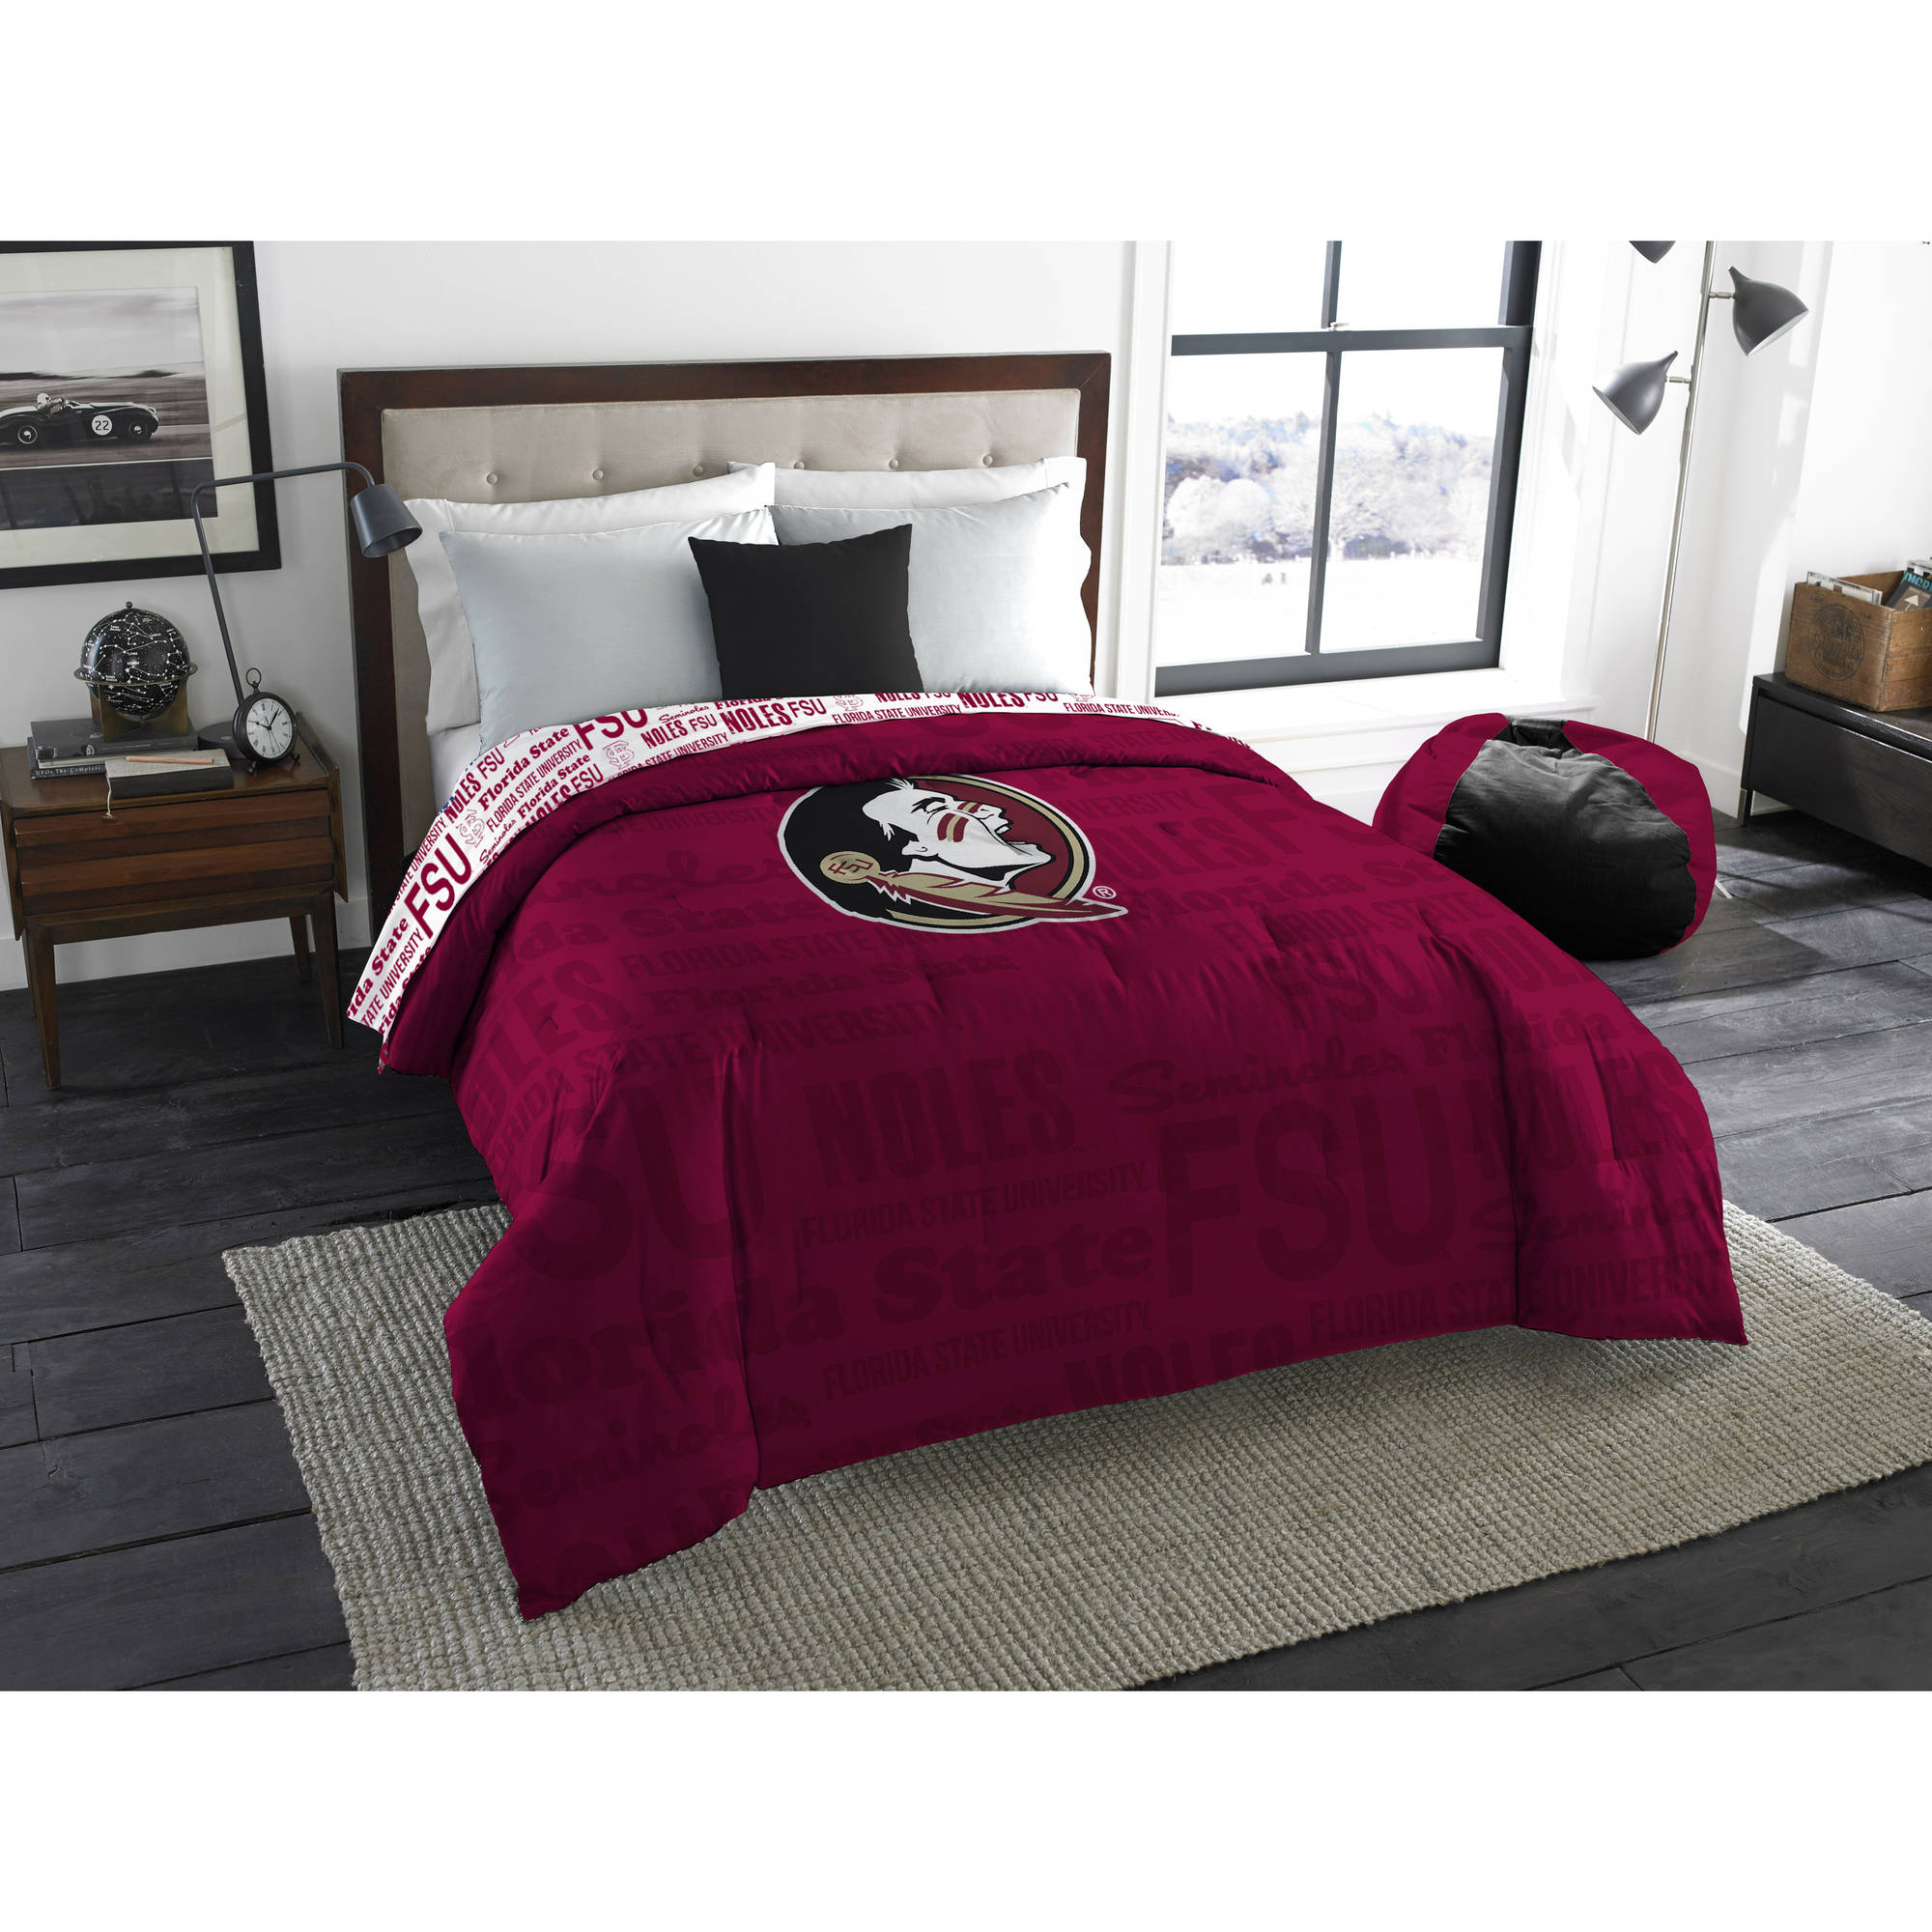 "NCAA Florida State Seminoles ""Anthem"" Twin & Full Bedding Comforter Set, 1 Each"